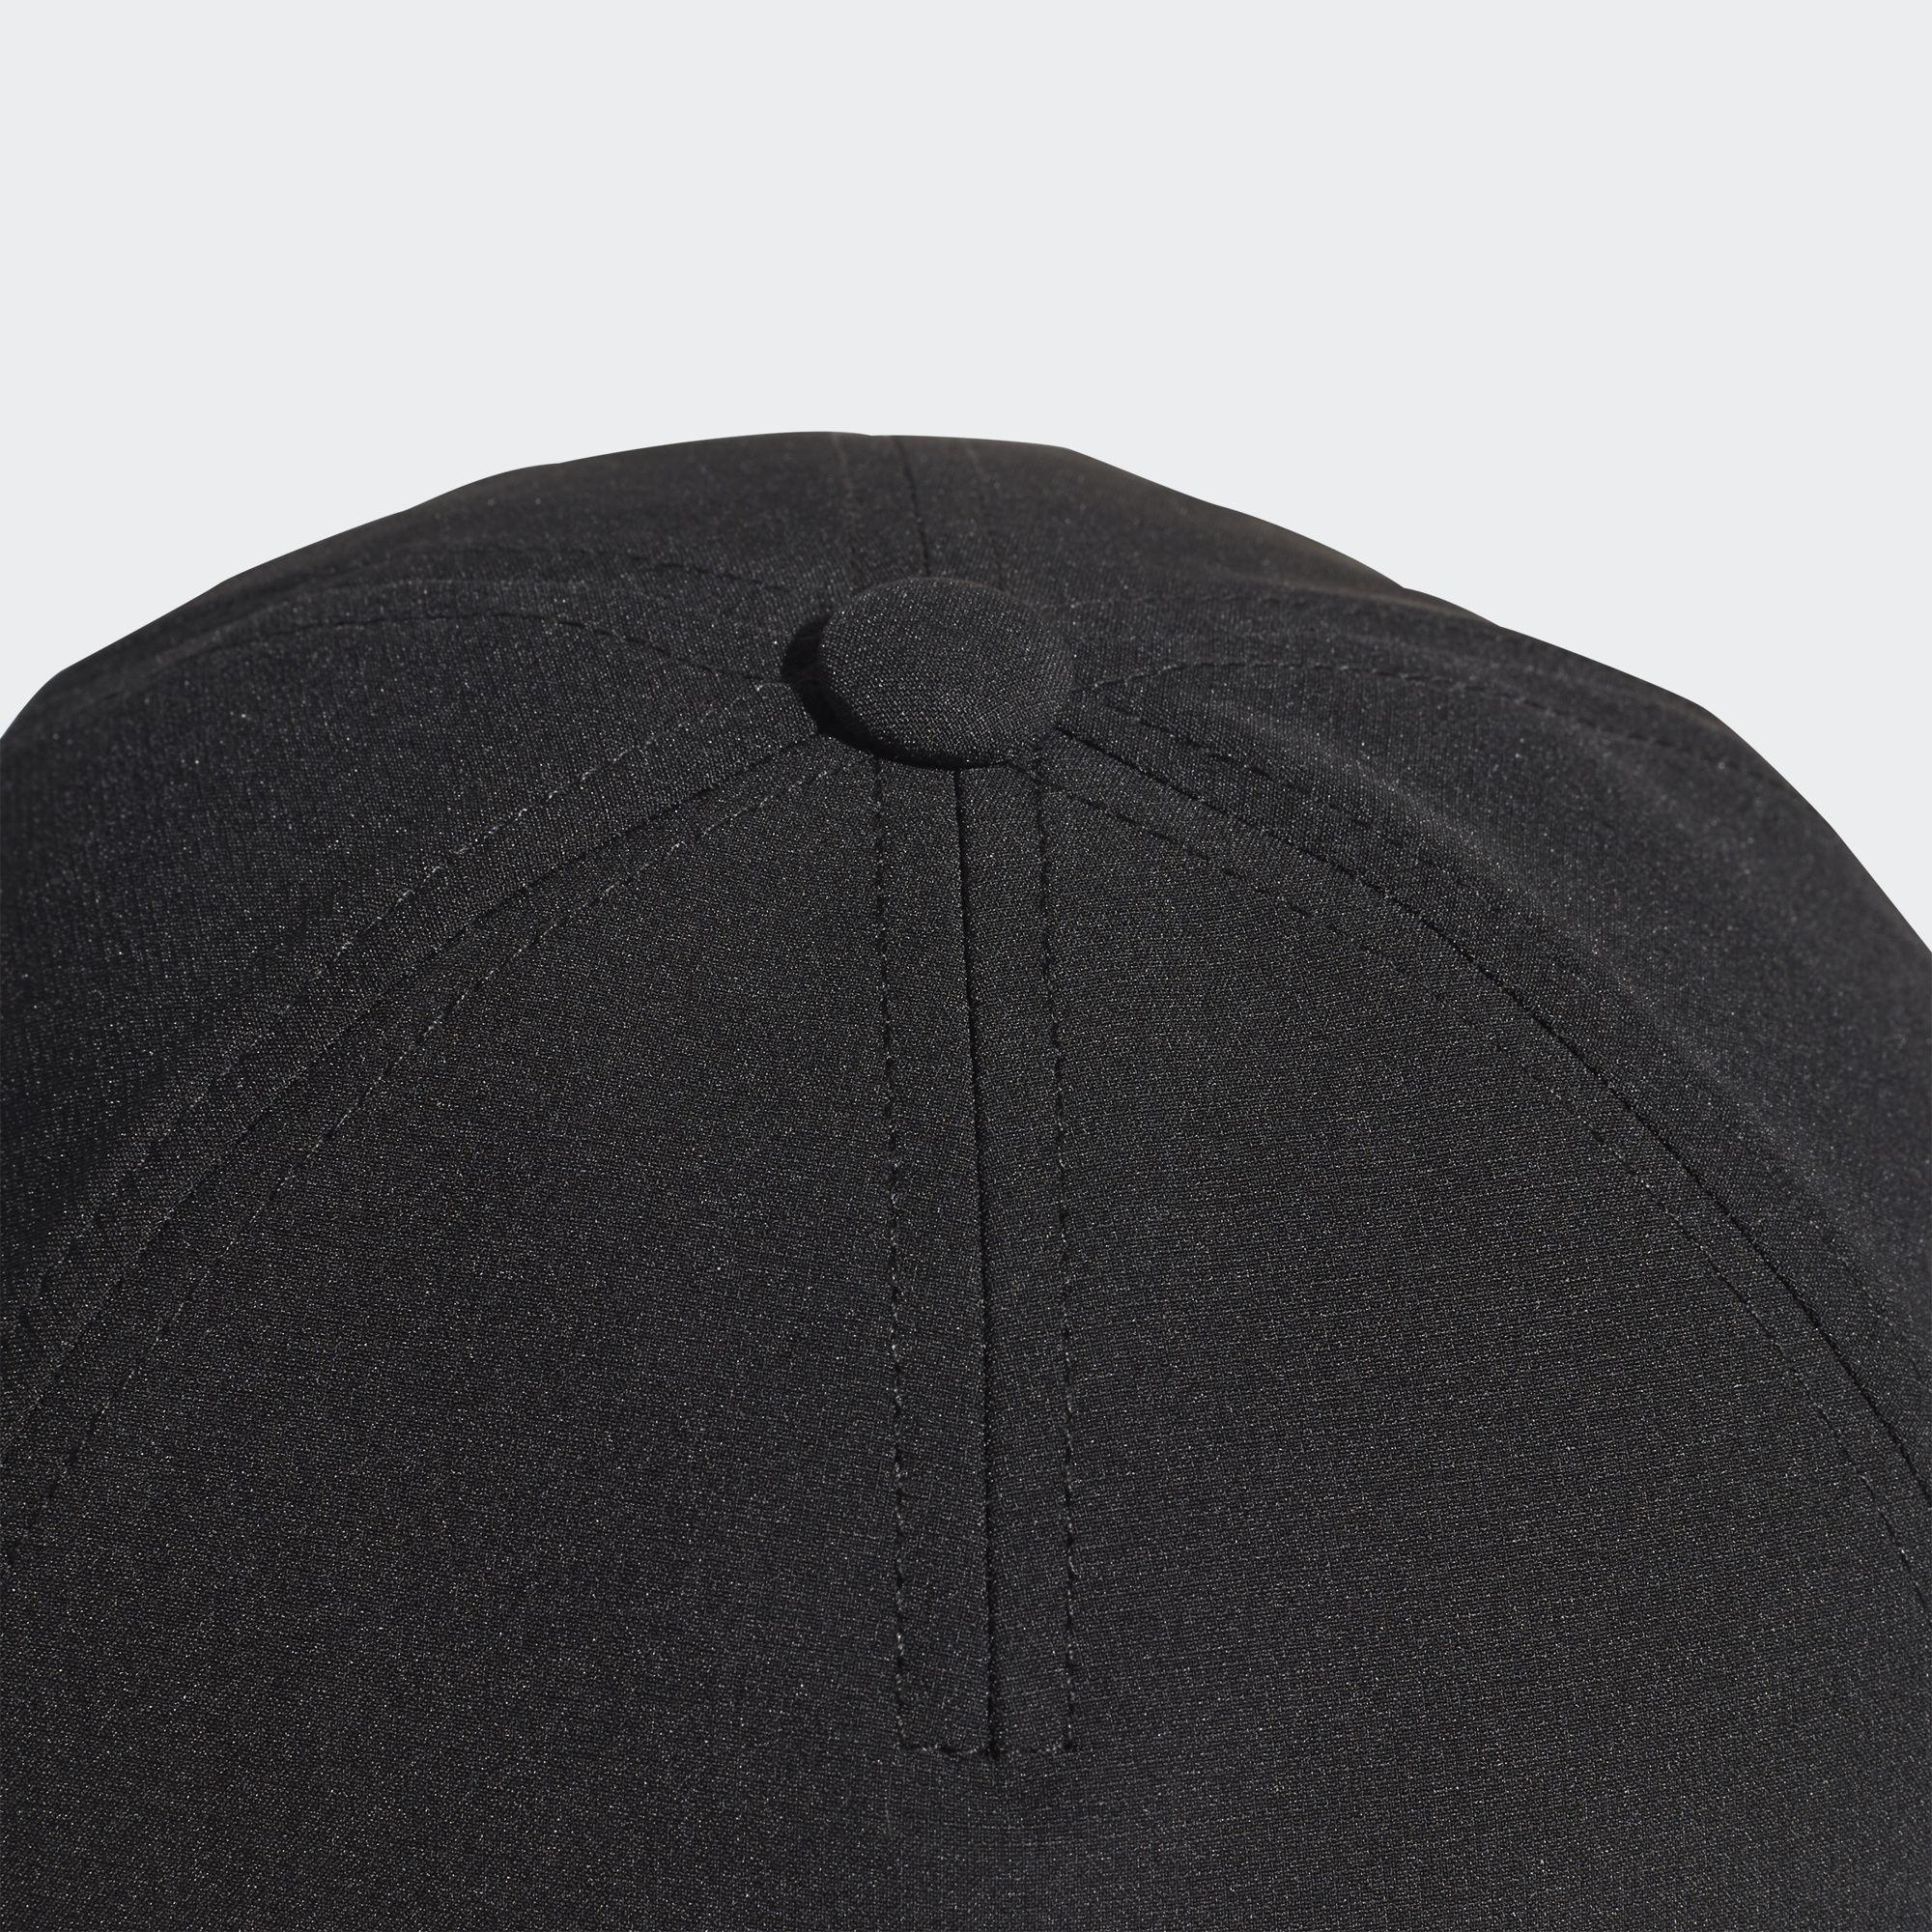 Adidas Adult 5 Panel Climalite Cap - Black White - Tennisnuts.com 43737791e6c2